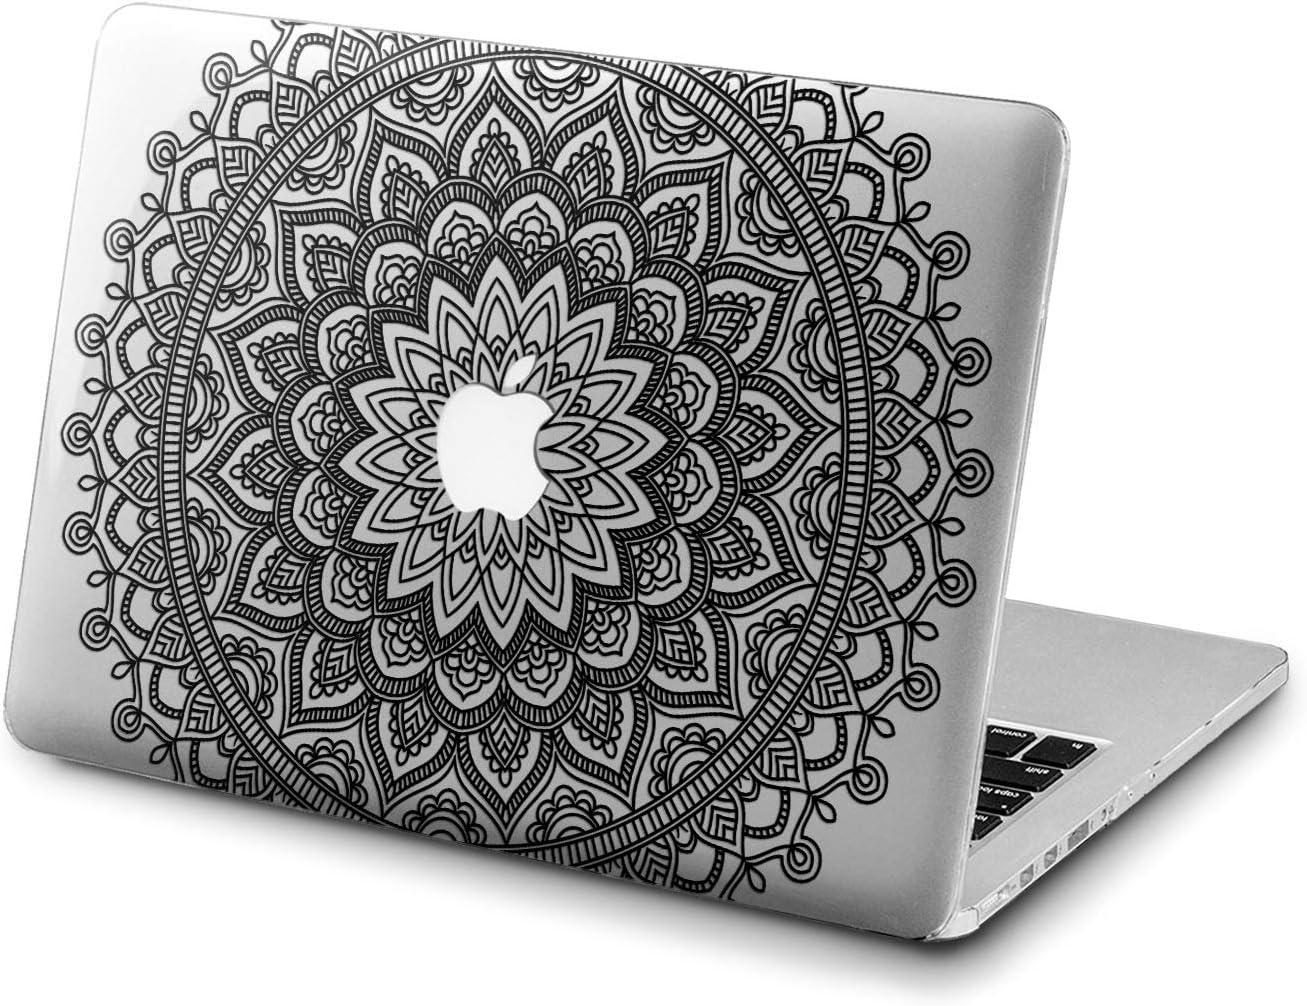 Lex Altern Clear Case for Apple MacBook Air 13 Mac Pro 15 inch Retina 12 11 2020 2019 2018 2017 2016 Beautiful Design Plastic Touch Bar Laptop Girls Boho Cover Pattern Mandala Black Lace Indian